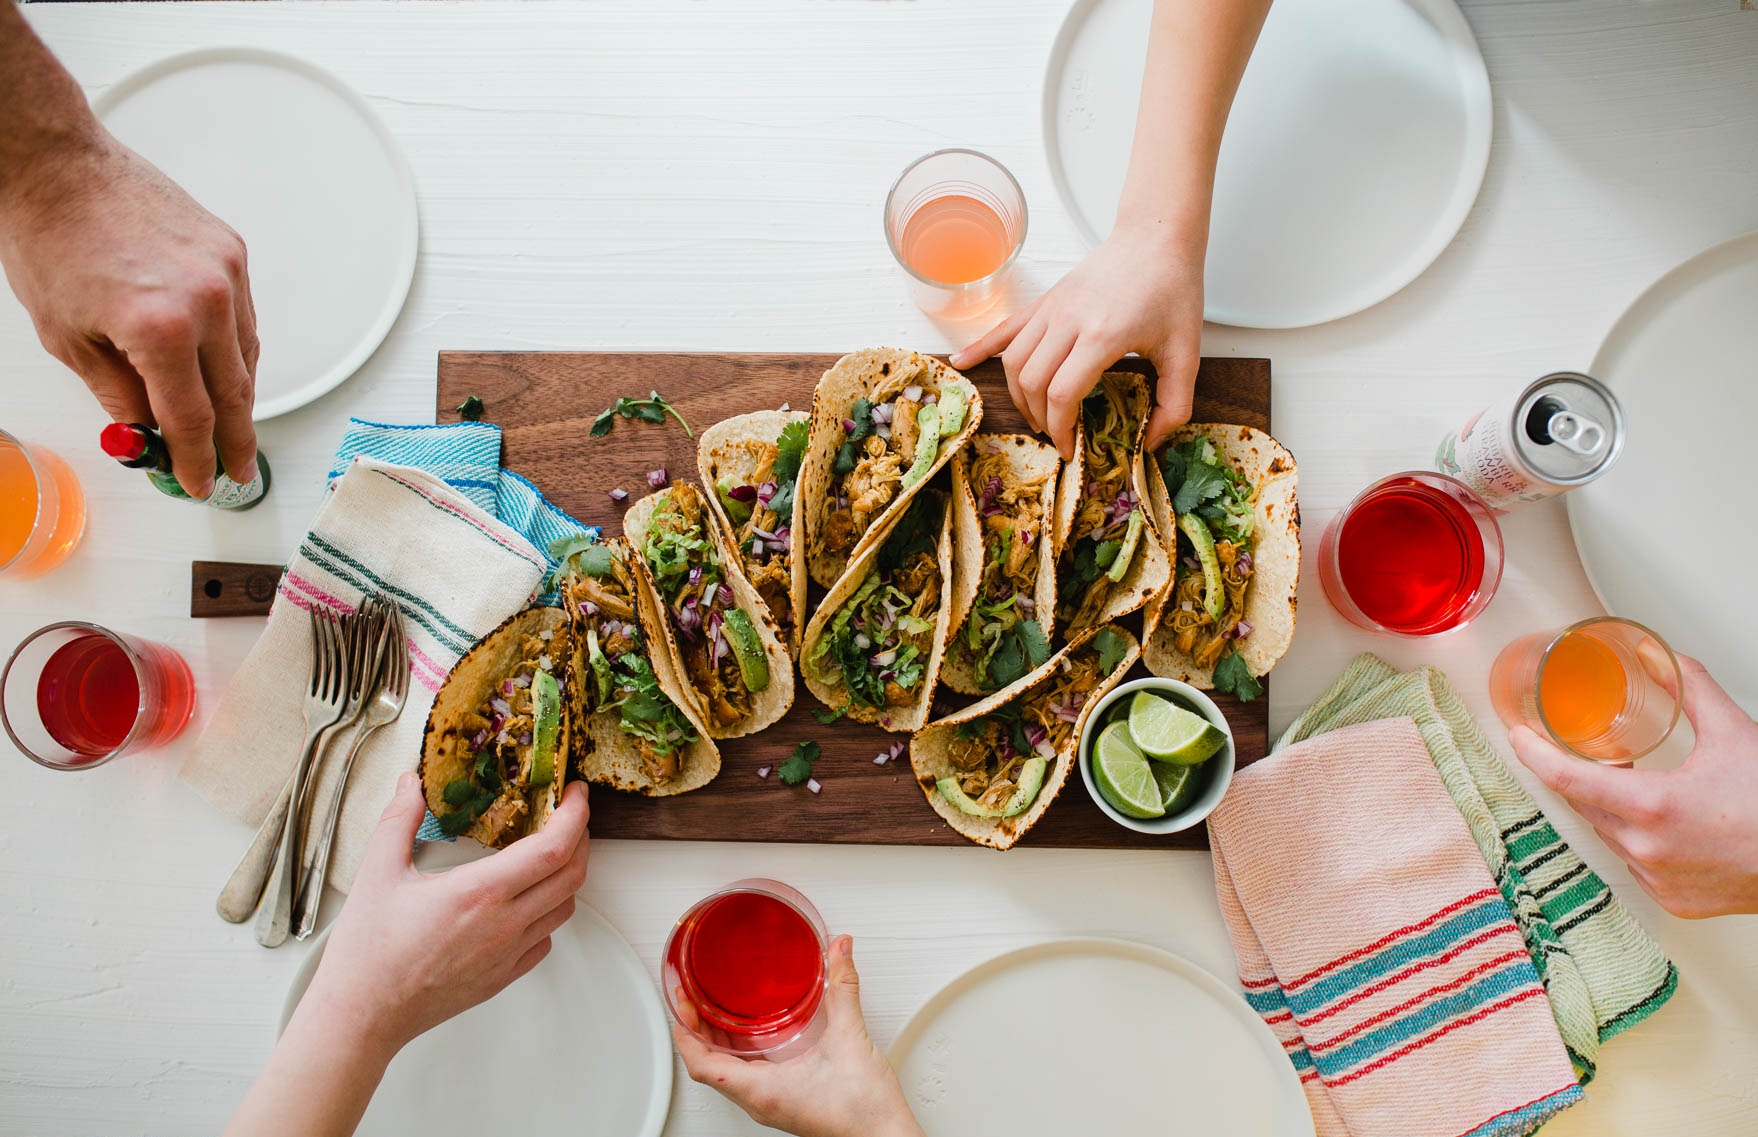 chicago-nyc-food-lifestyle-photographer-9.jpg